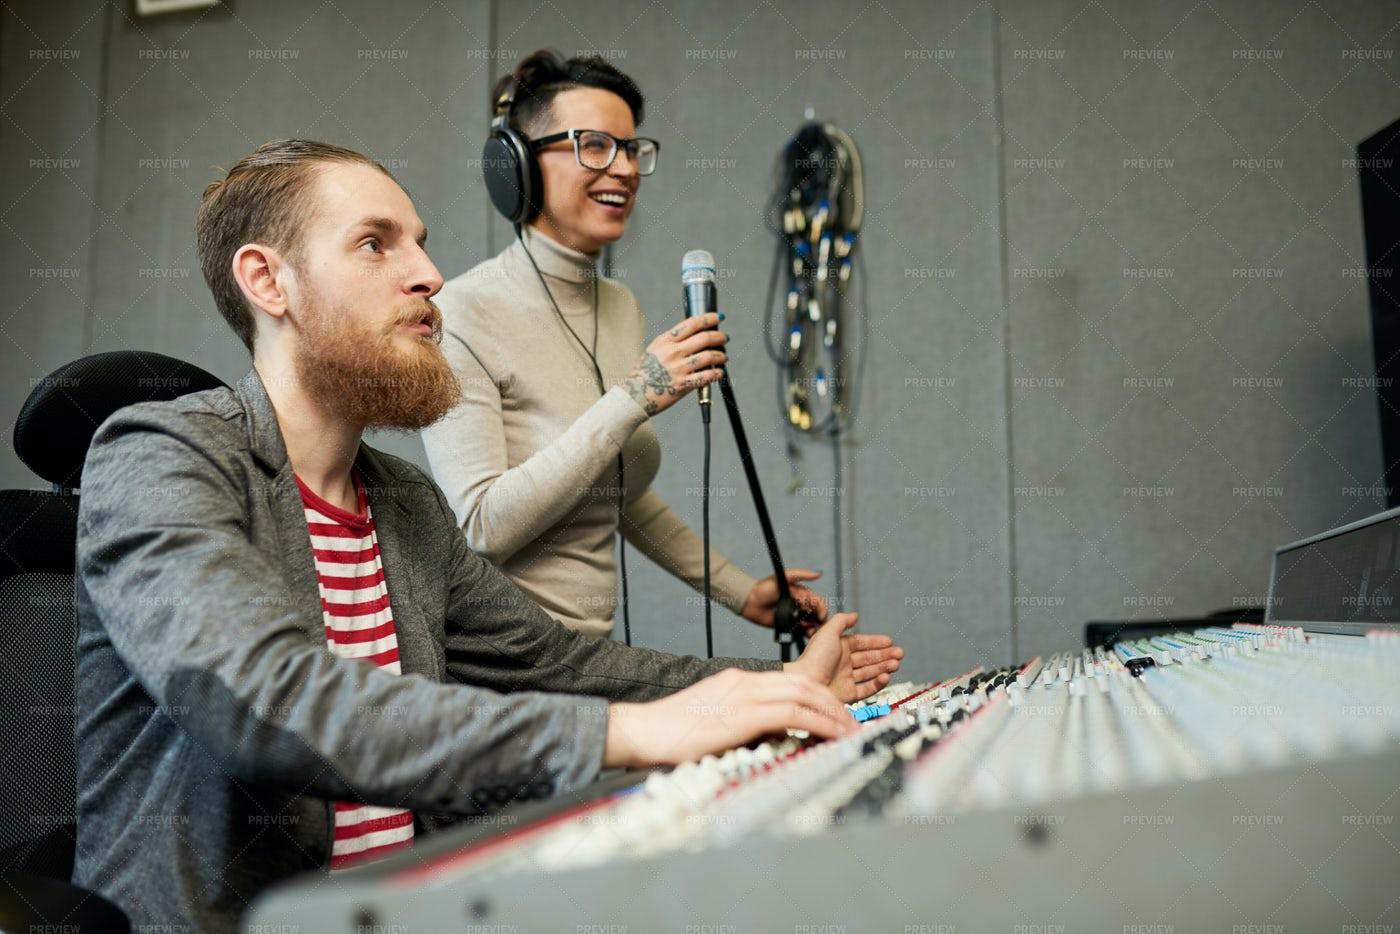 Sound Designer And Singer Recording...: Stock Photos